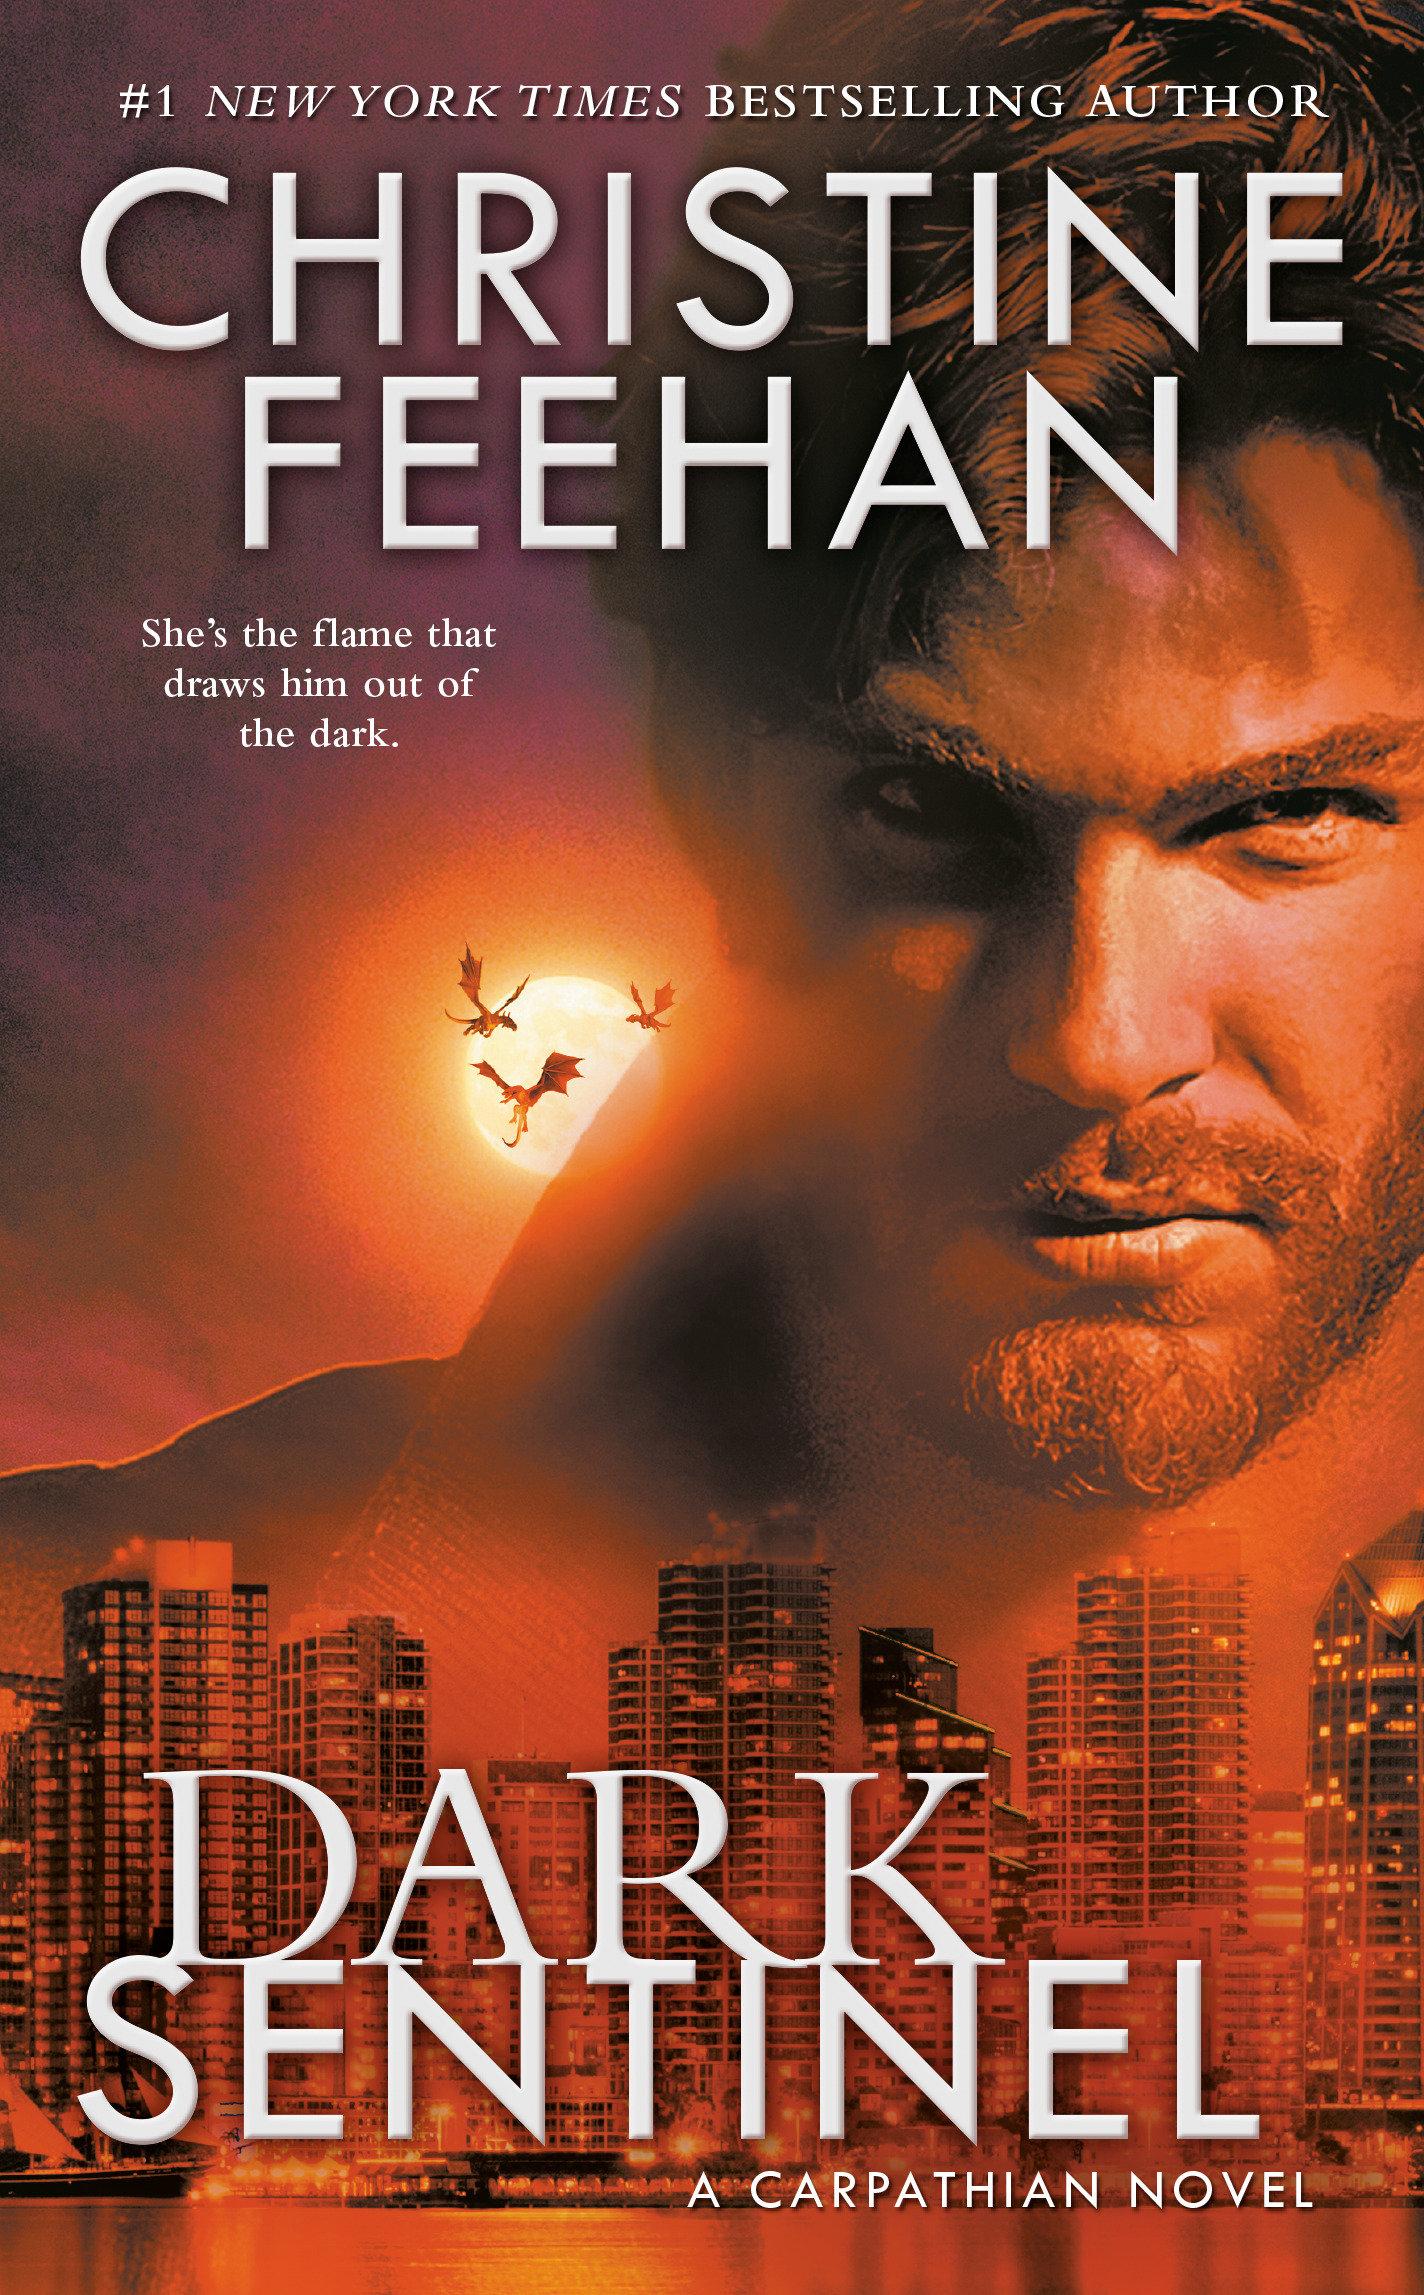 Dark sentinel cover image